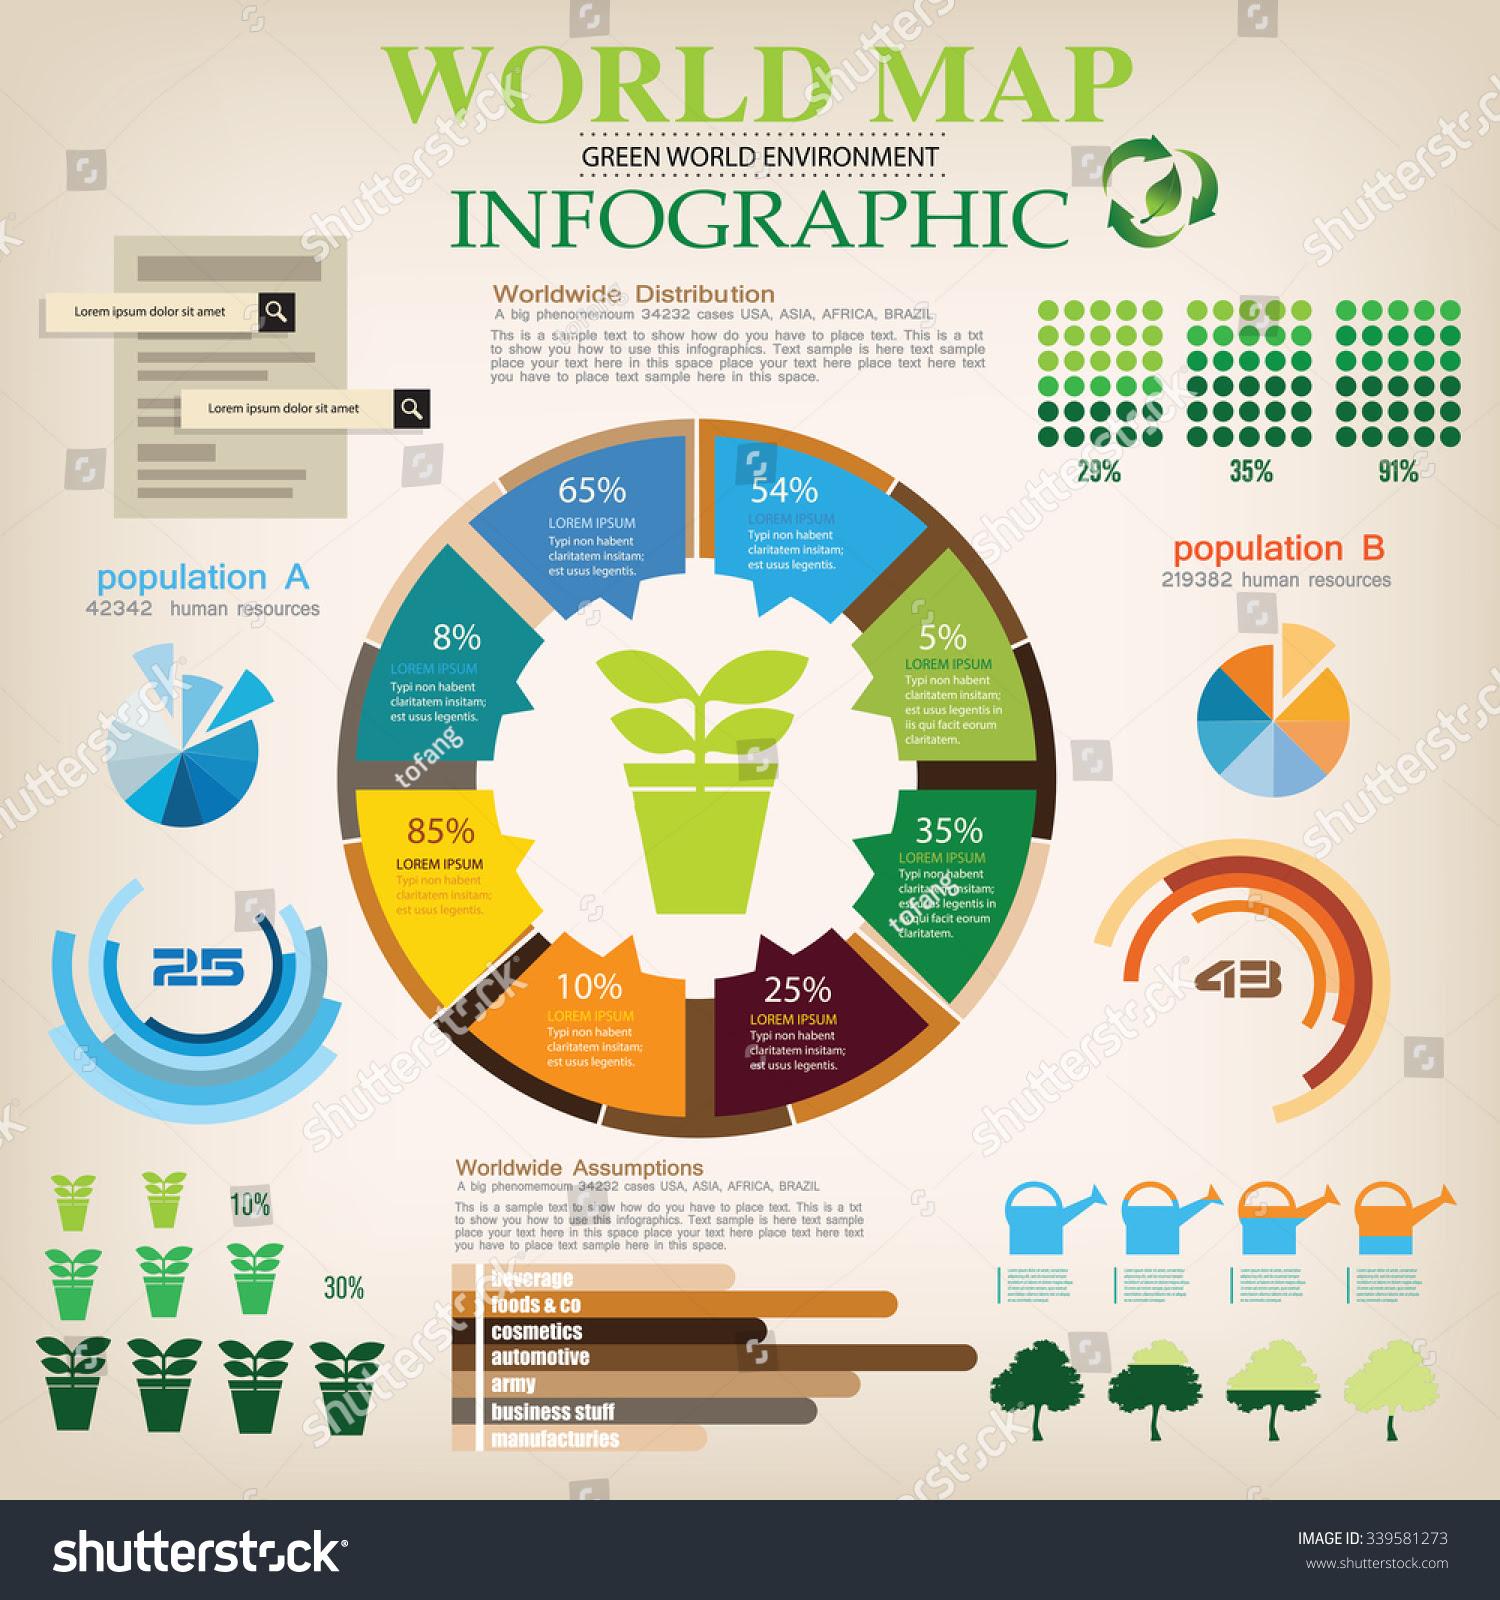 Eco Map Info Graphic Vector Stock Vector 339581273 - Shutterstock